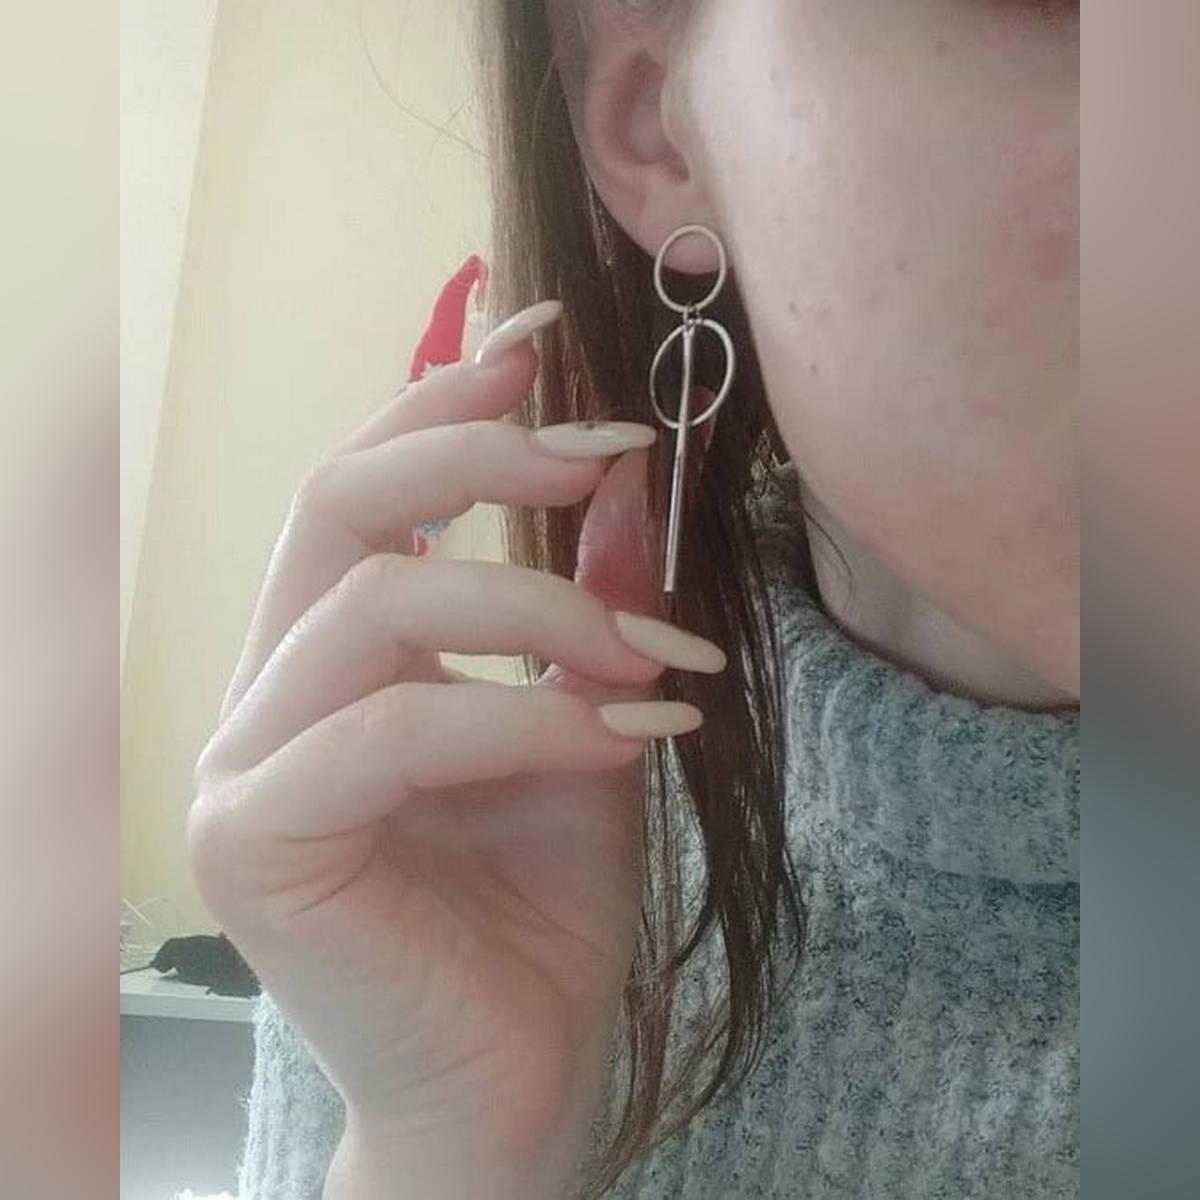 Korean Style Acrylic Drop Earrings - Stylish earrings for girls 2021- Beautiful Earings for Girls 2021 - Trendy Earings 2021 - Long Imported Fashion Jewellery